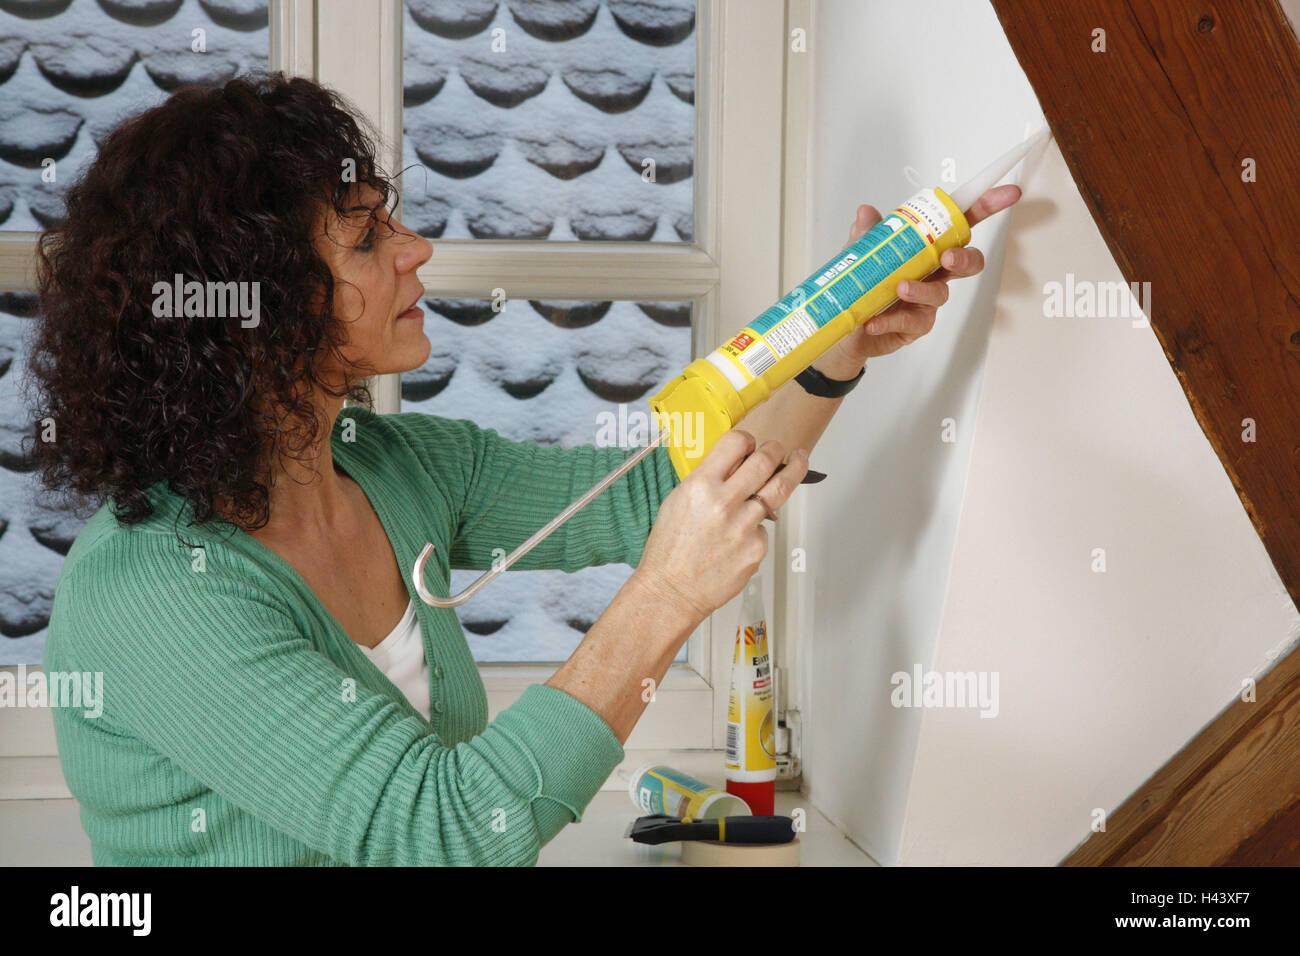 Silikon Spritze Dach Dichtung Model Release Frau Person